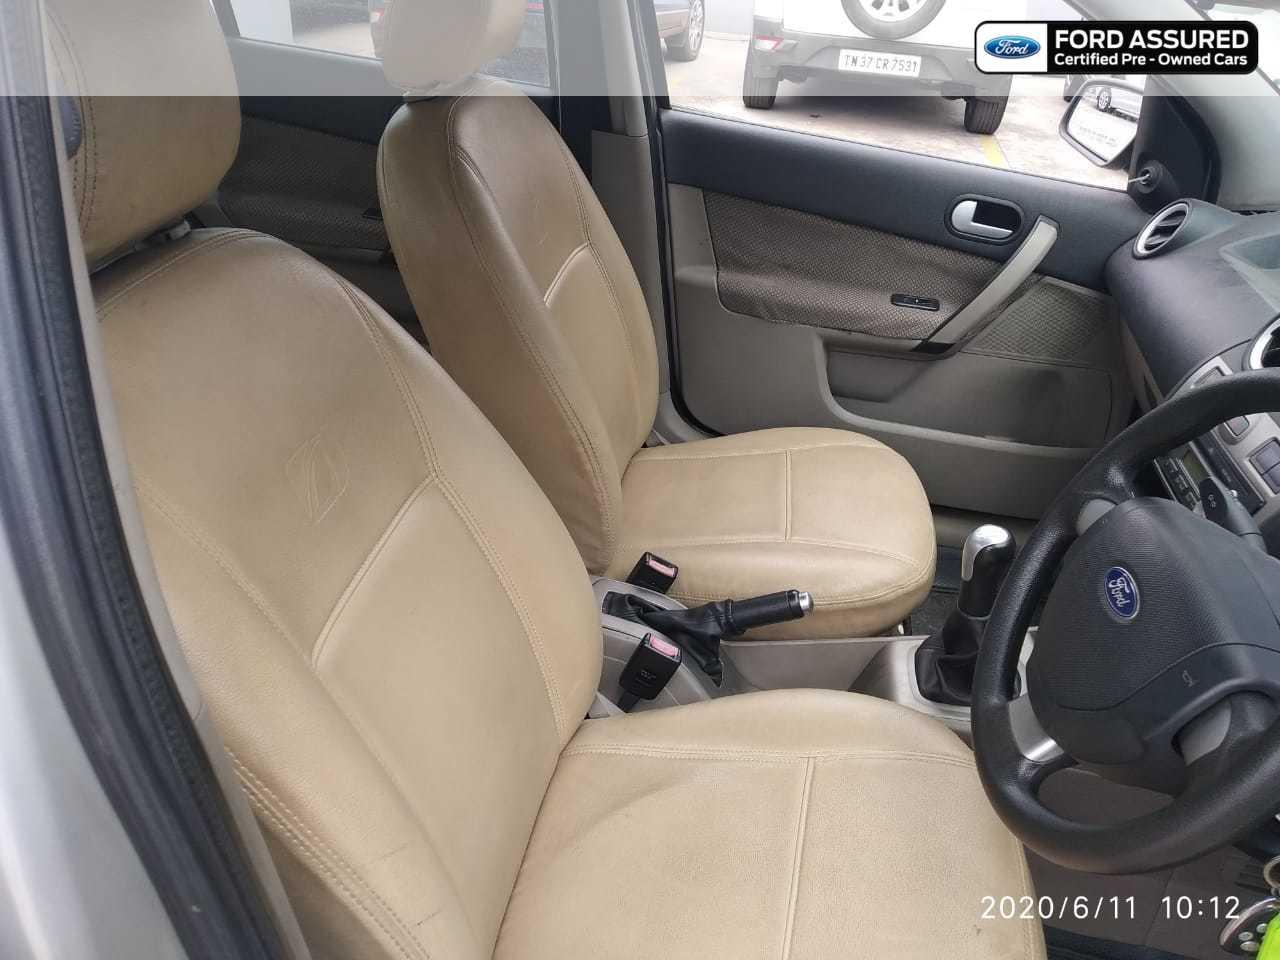 Ford Fiesta 2004-2008 1.4 ZXi TDCi ABS